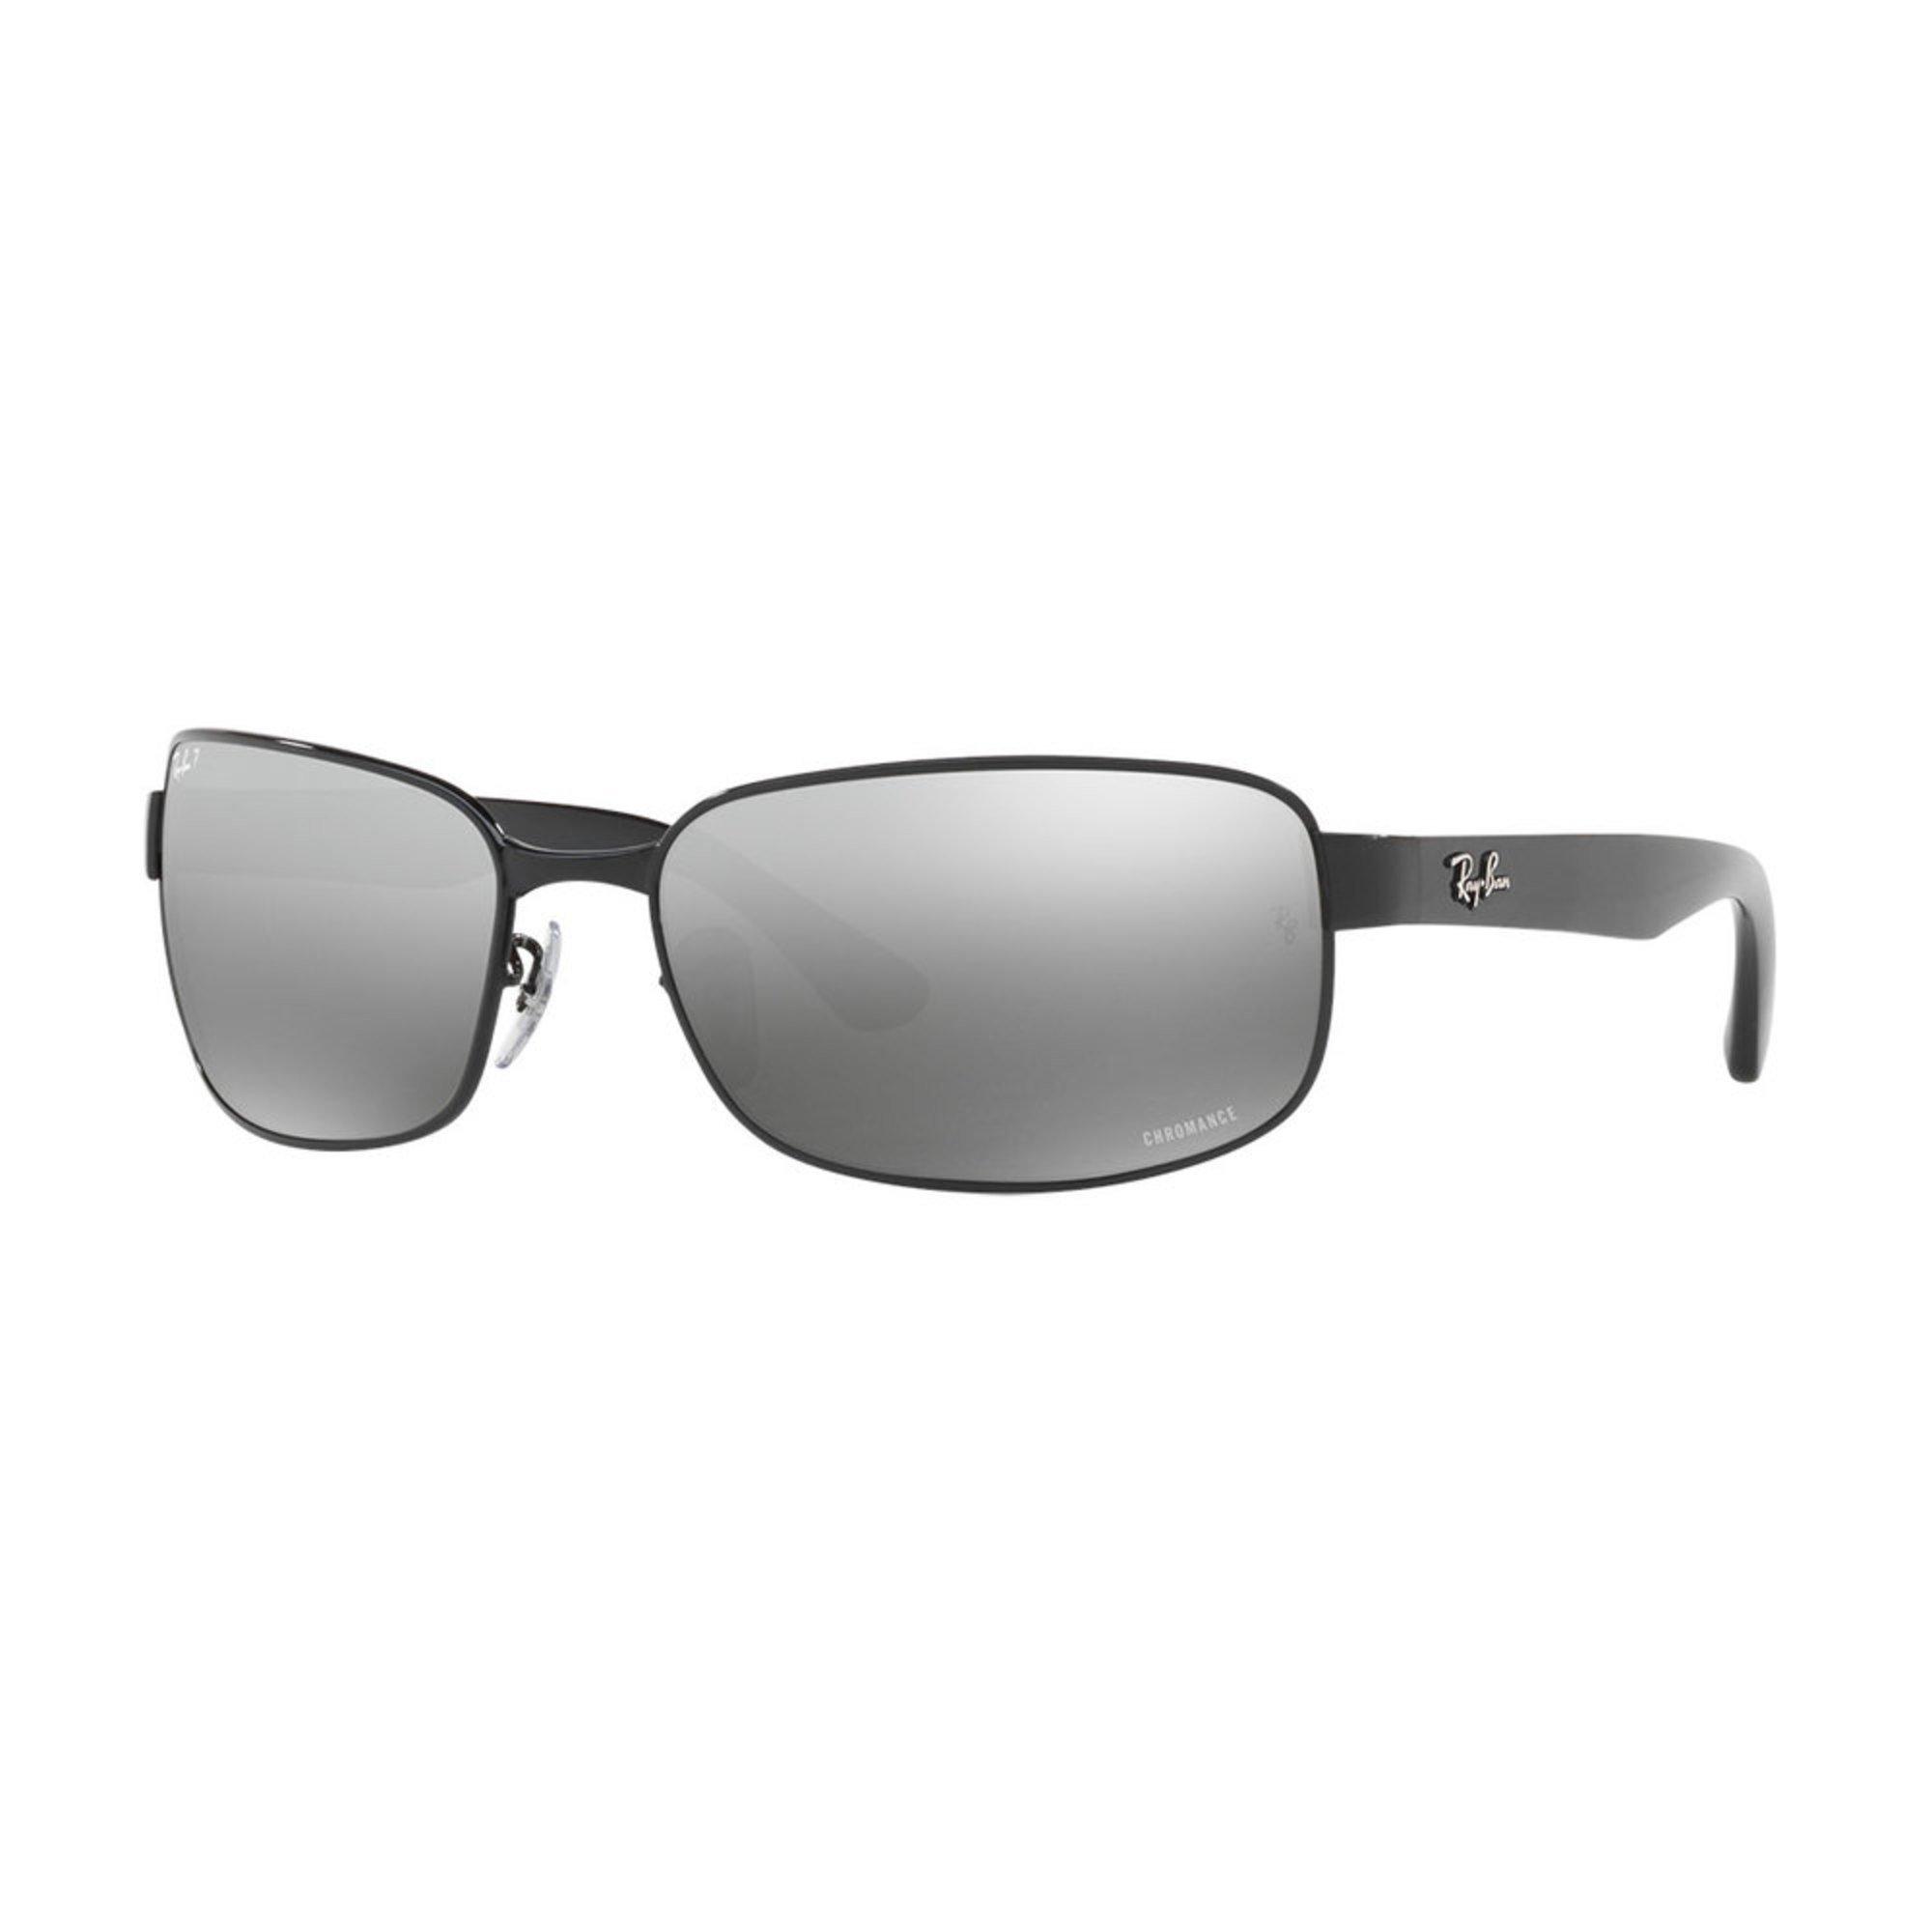 a1ee1d8f610 Ray-Ban. Ray-Ban Men s Rectangle Shiny Black Polarized Sunglasses 65mm